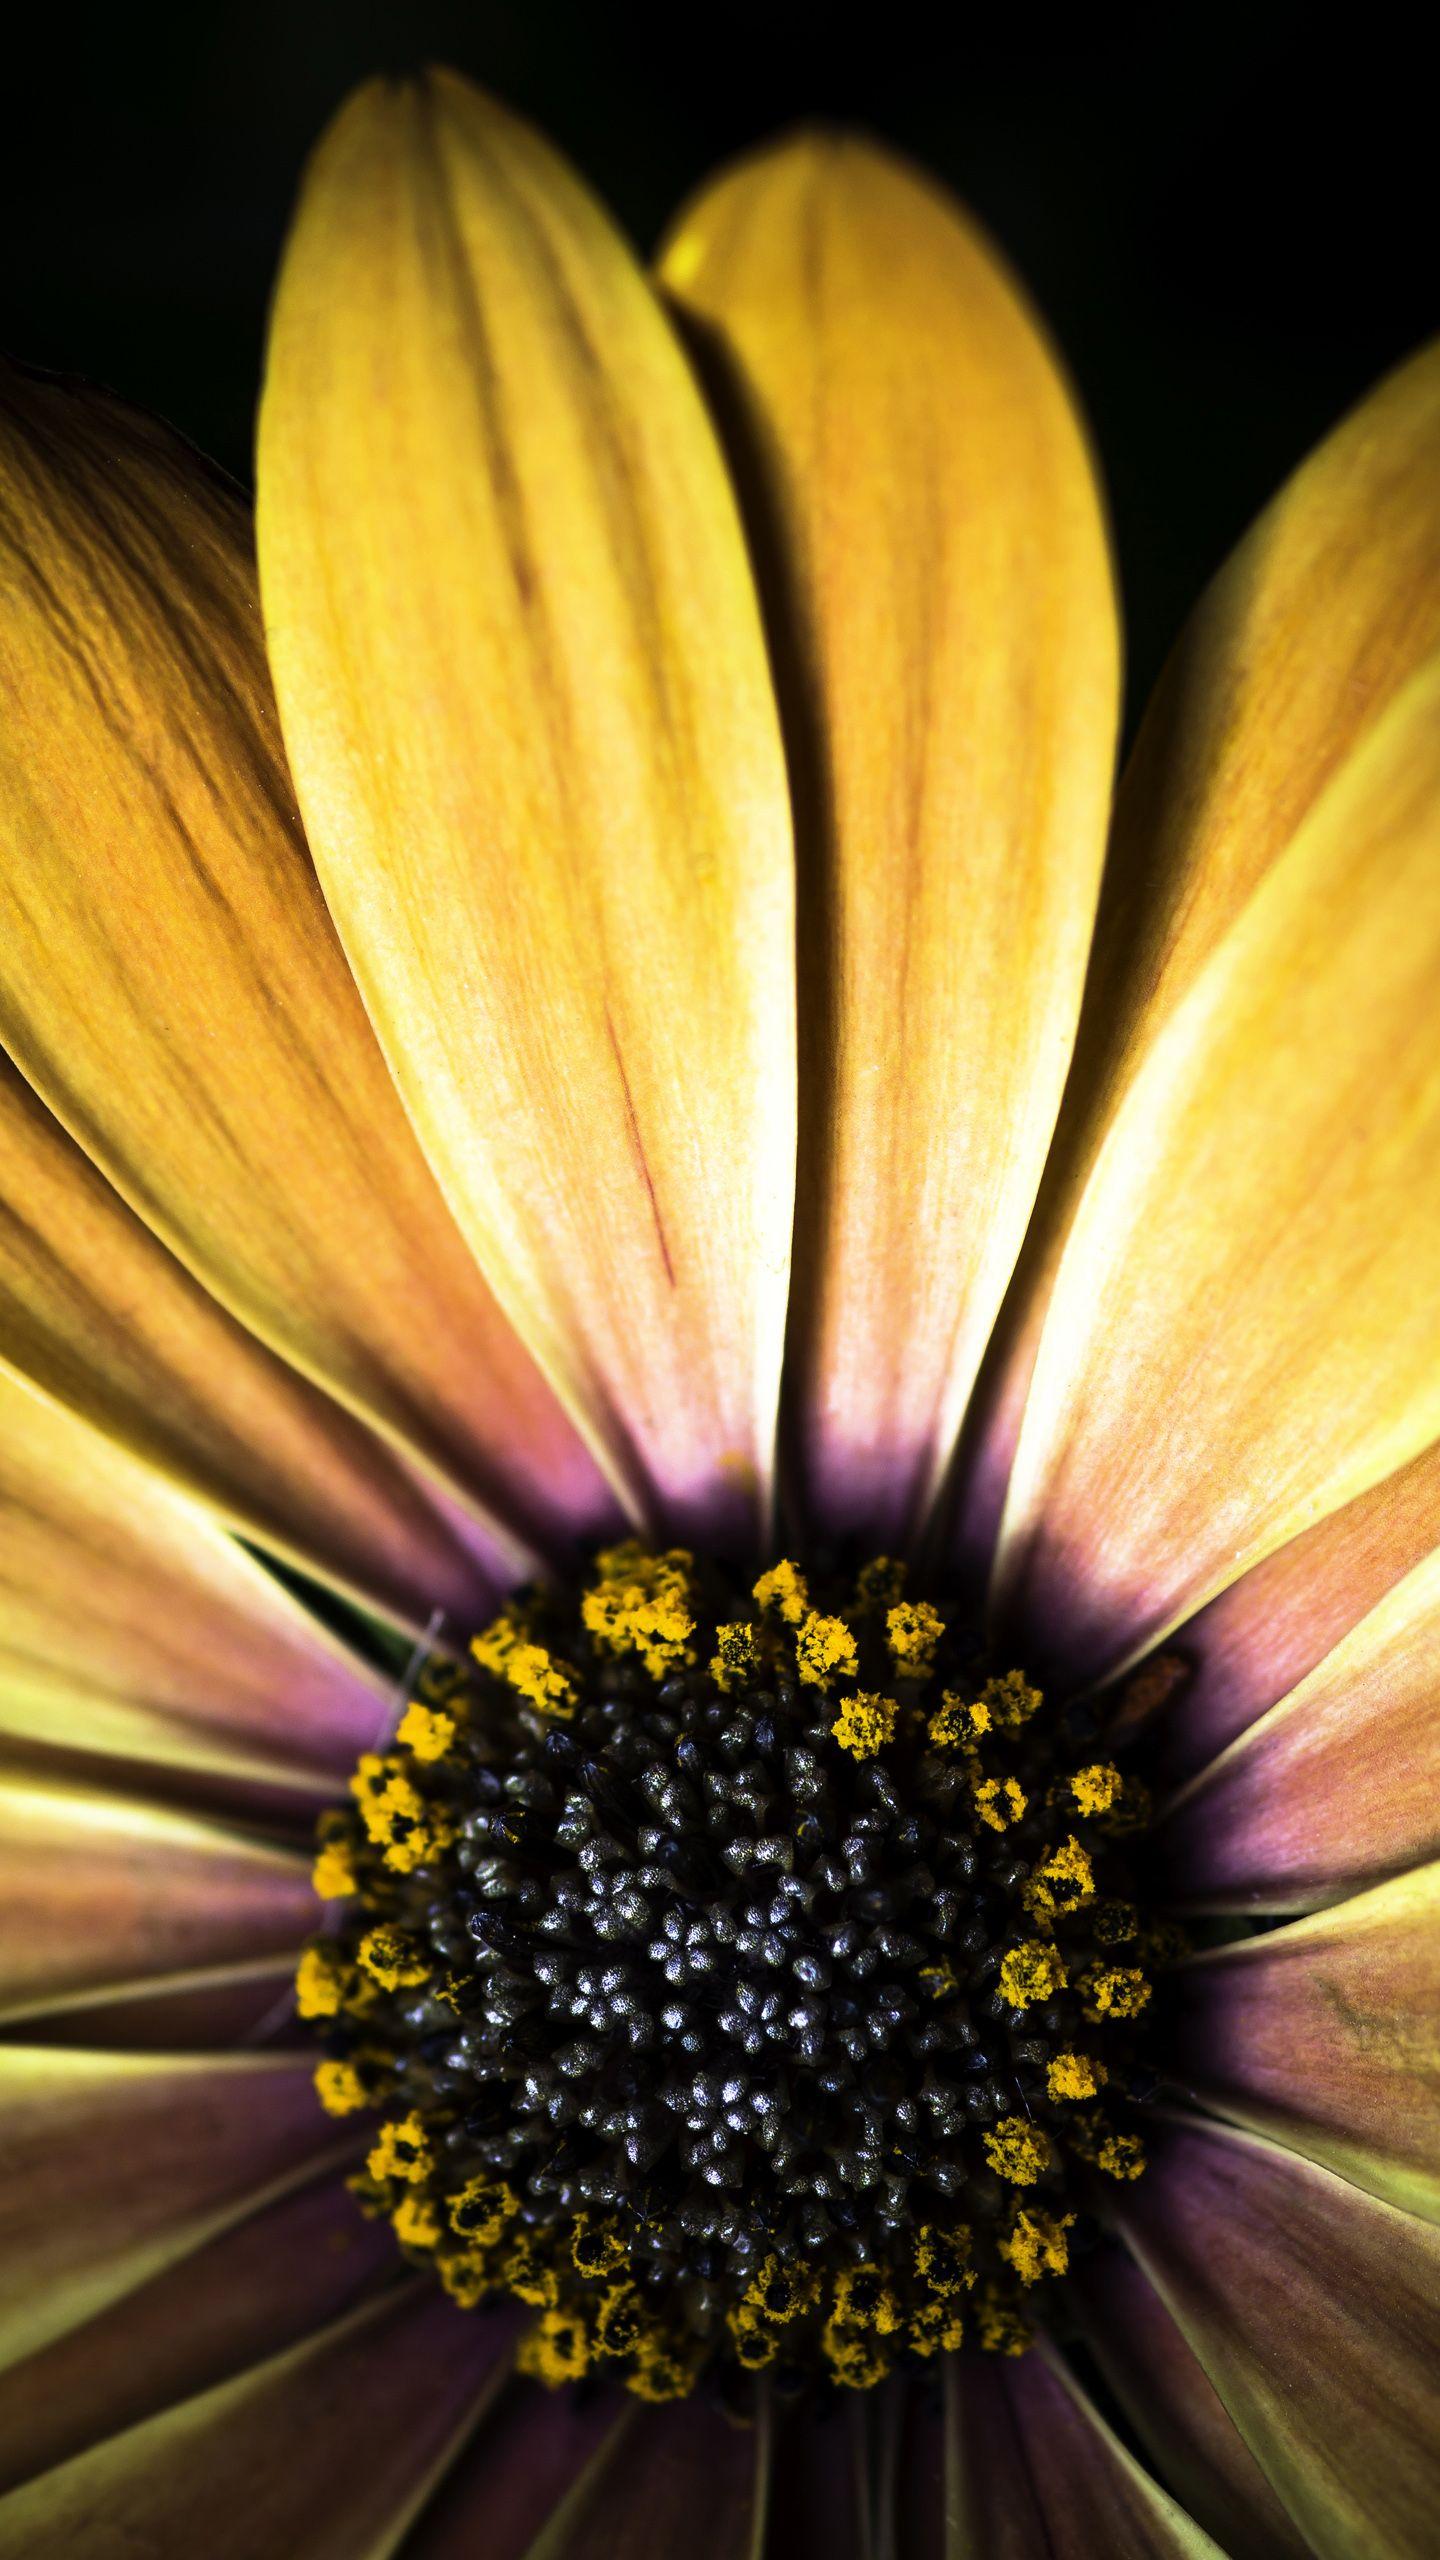 Big Yellow Flower Galaxy S6 Wallpaper 1440x2560 Yellow Flowers Wonderful Flowers Yellow Flower Wallpaper Fantastic yellow flower hd wallpaper